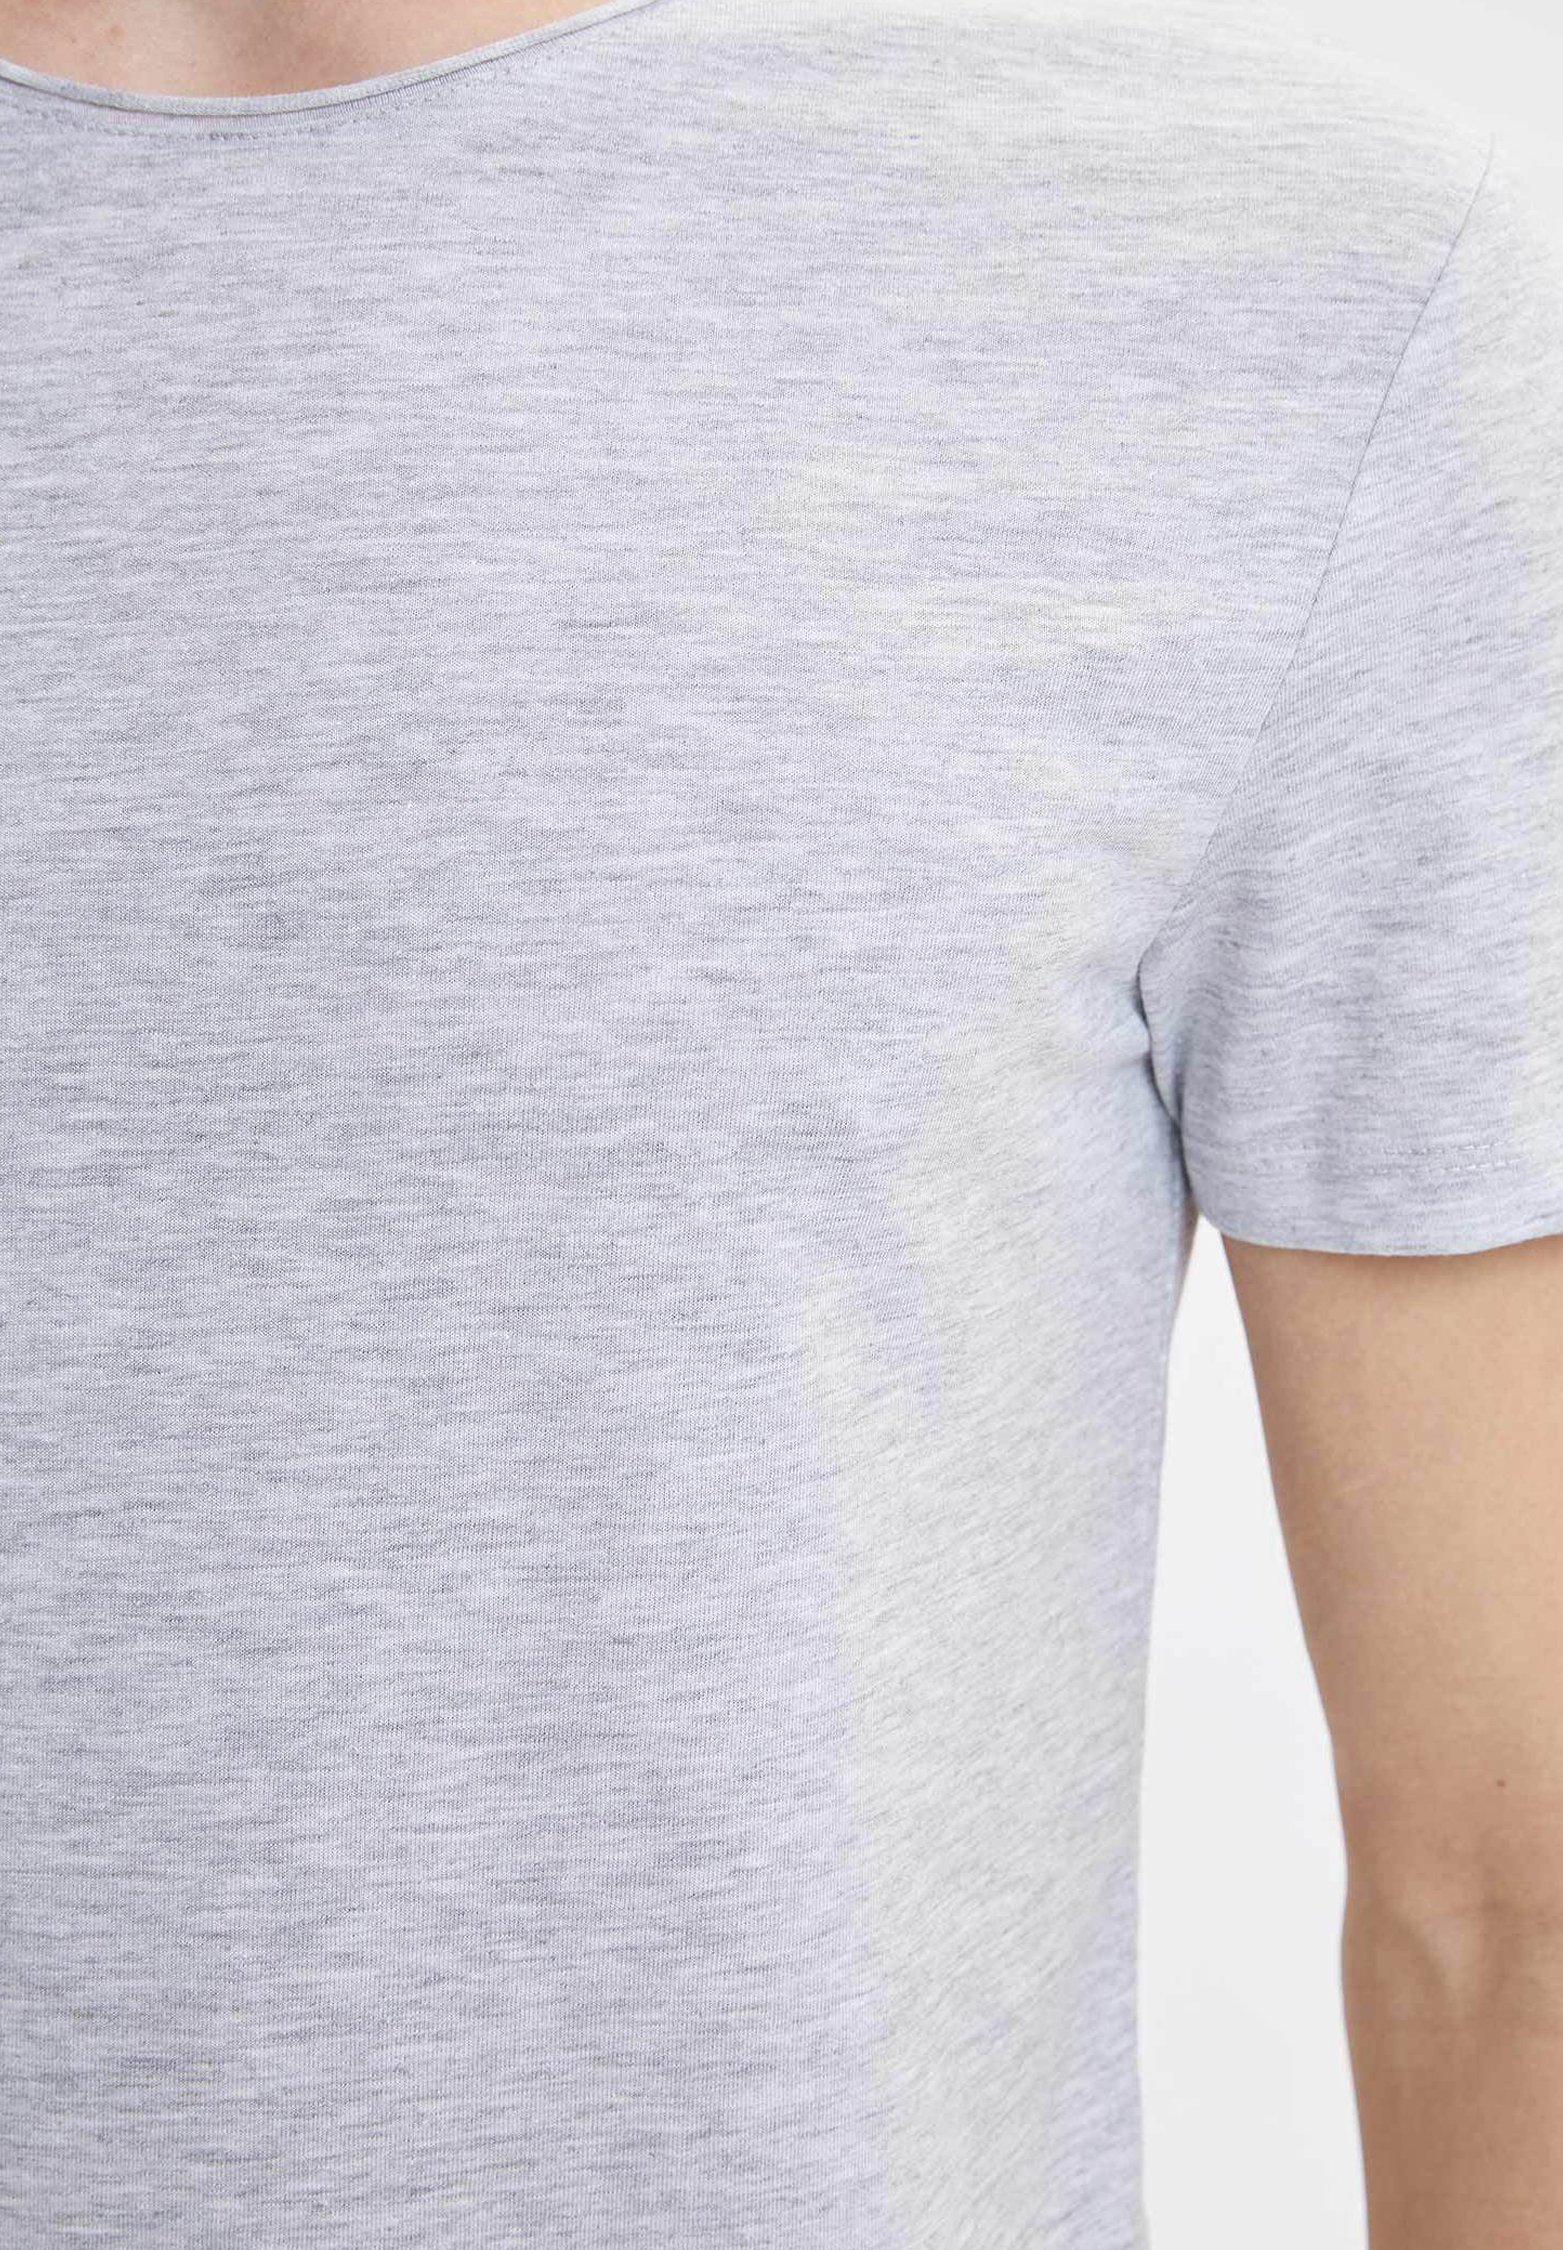 DeFacto Basic T-shirt - grey NWLA6